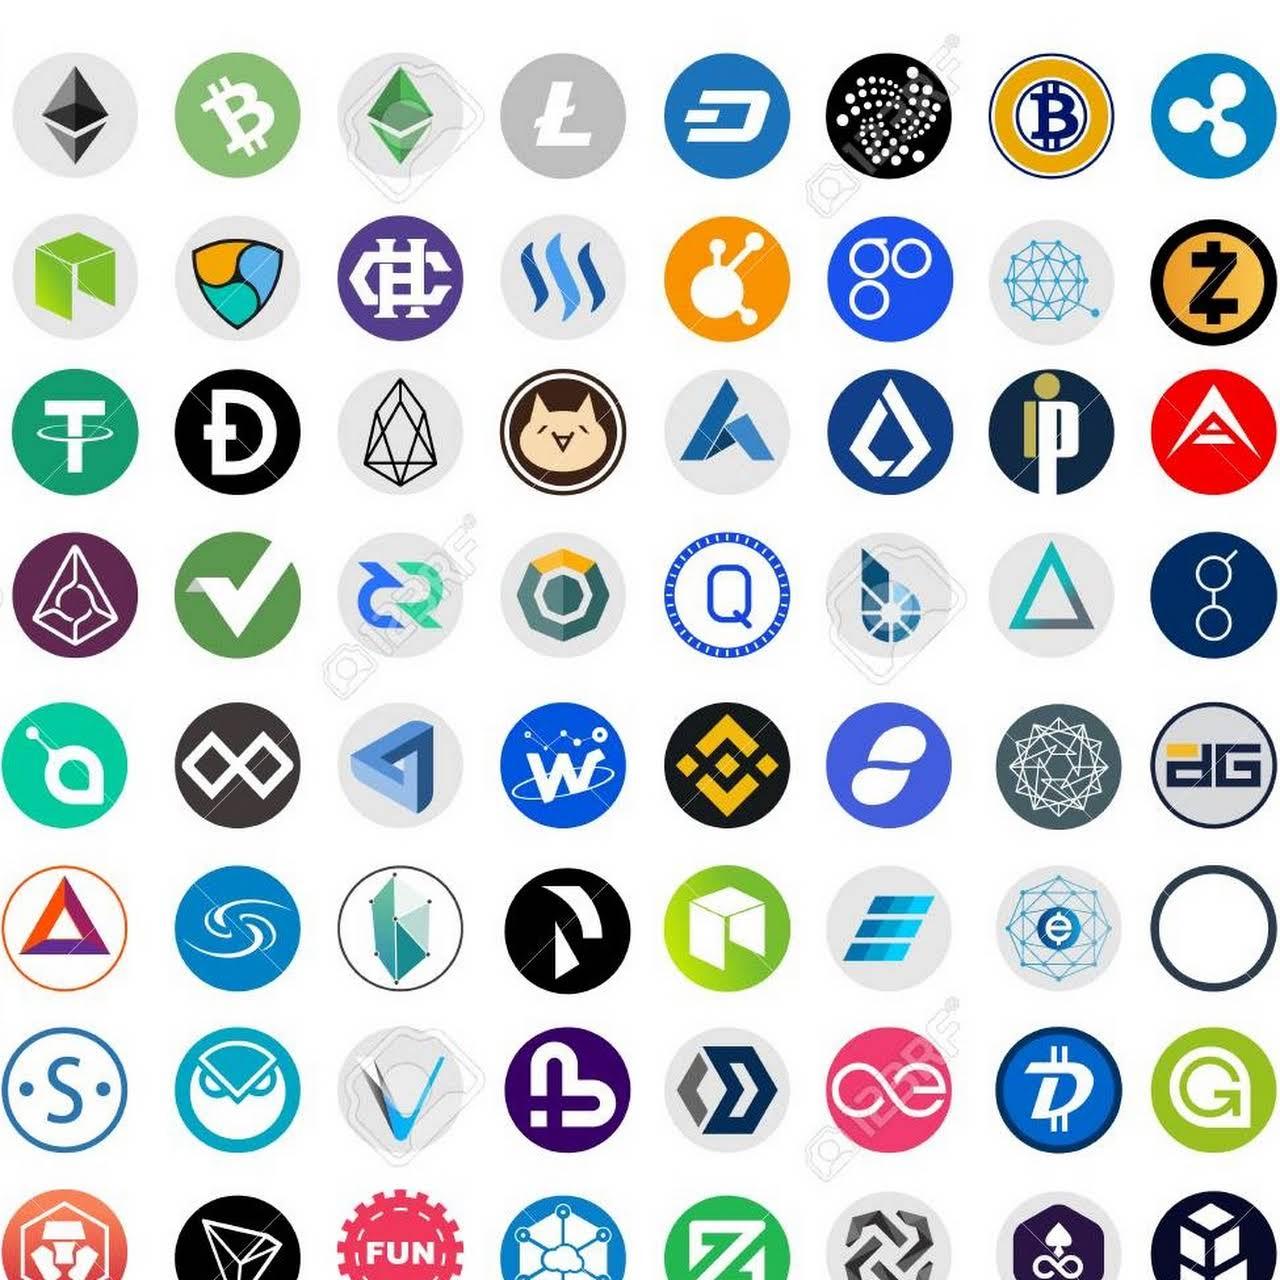 itunes bitcoin pénztárca rövid bitcoin stratégia etf